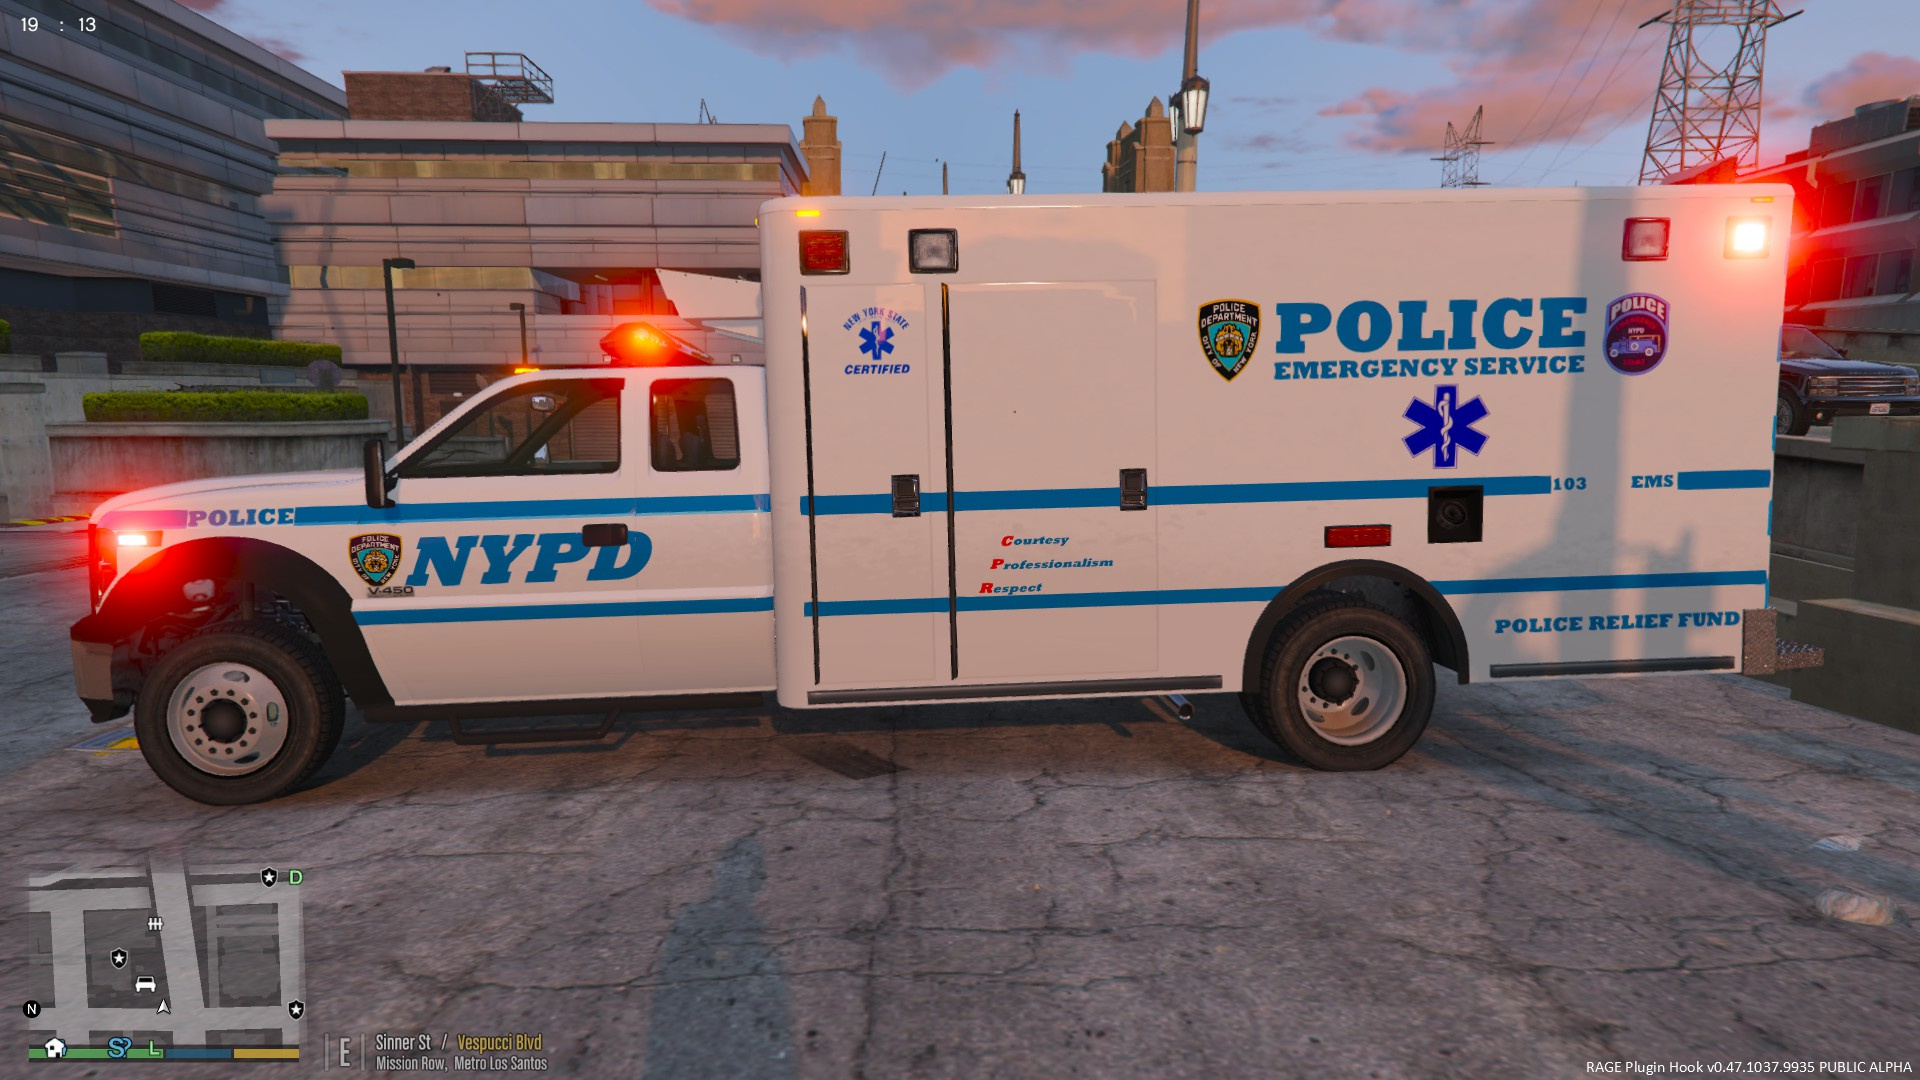 NYPD ESU EMS V450 Ambulance  GTA5Modscom